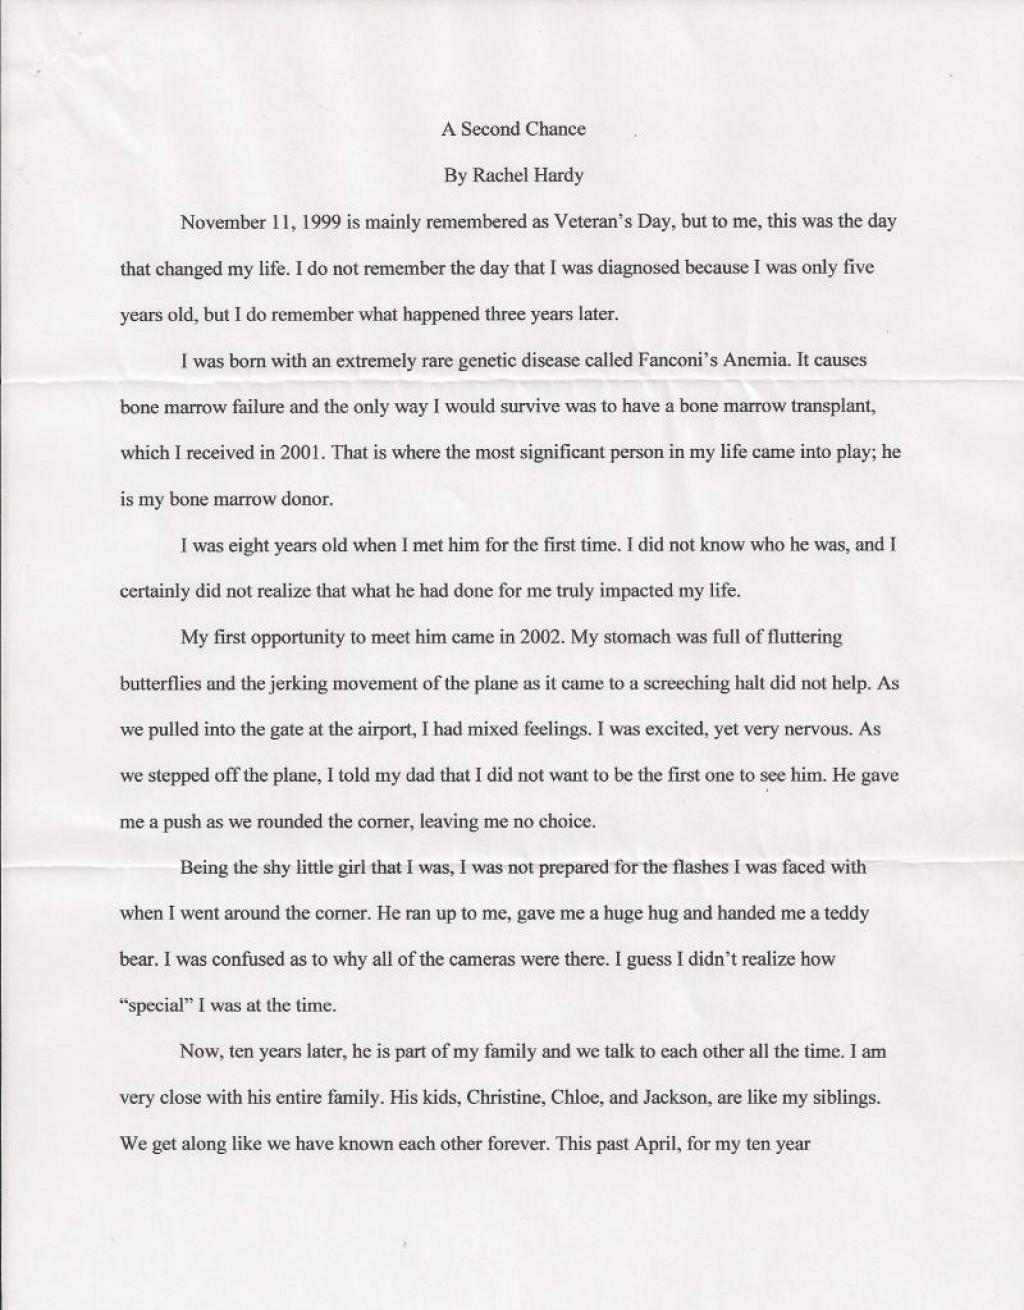 010 Essay Example Rachel Hardy 1 206151151 Std Scholarship Stunning Sample Leadership For Mba Large